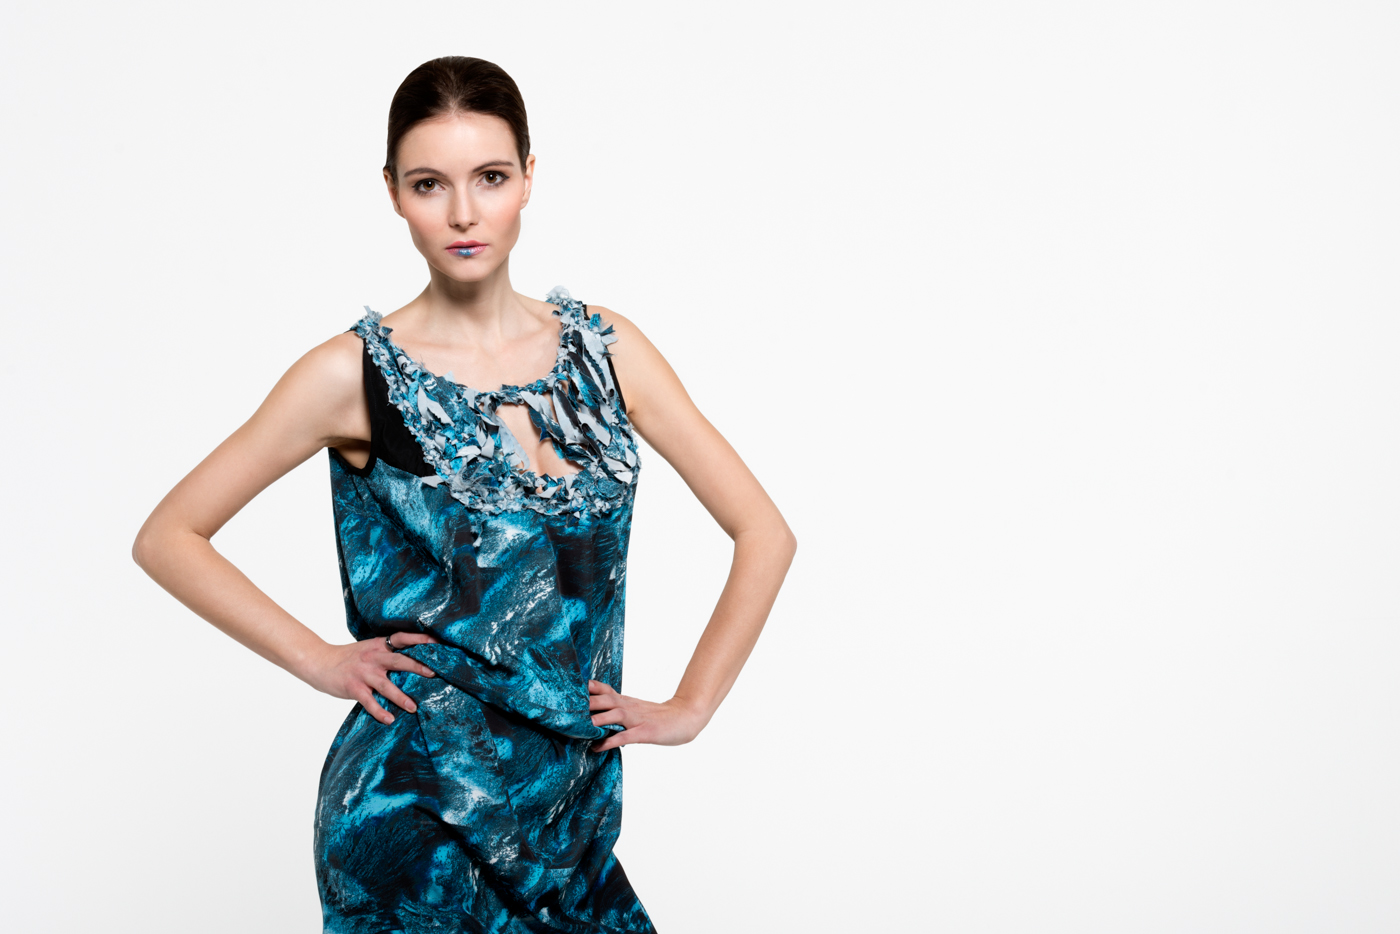 Dress: Carla Cixi Crocheting // Model: Jana Jecht // MUA: Diana Guti // Foto & Retouch: Sebastian Kreinau